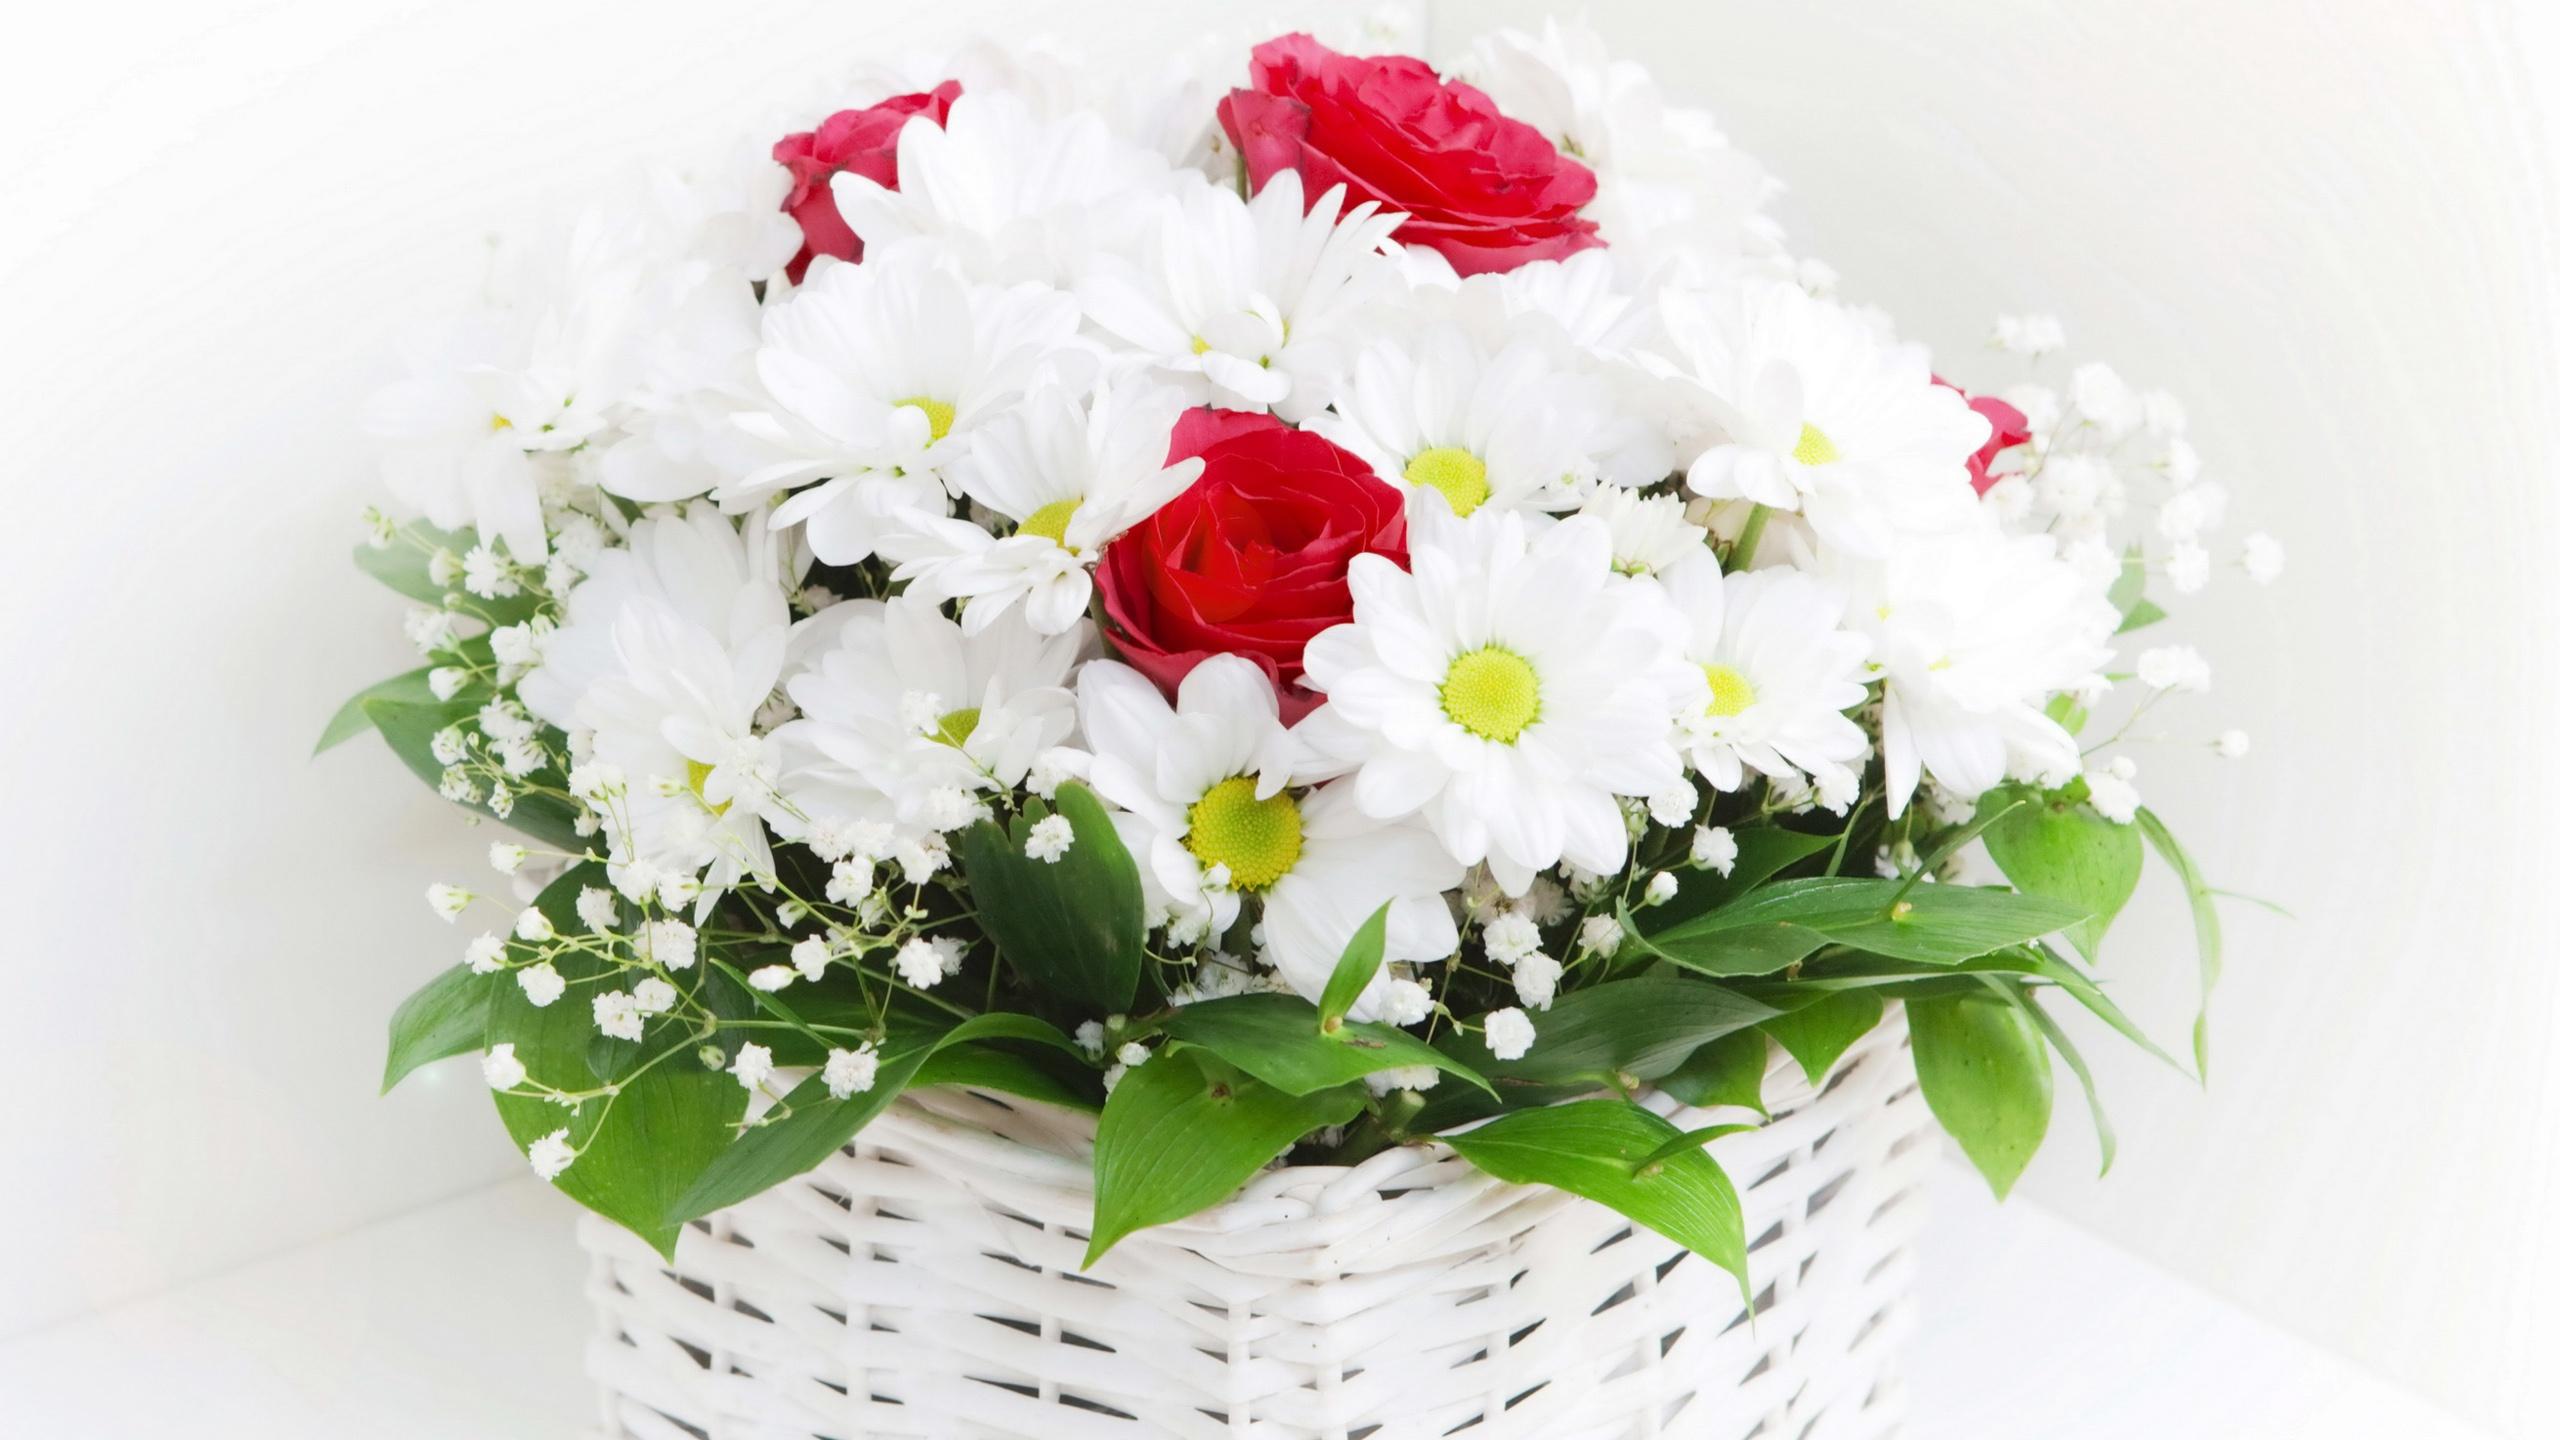 http://fr.best-wallpaper.net/wallpaper/2560x1440/1302/Bouquets-Camomile-flowers_2560x1440.jpg